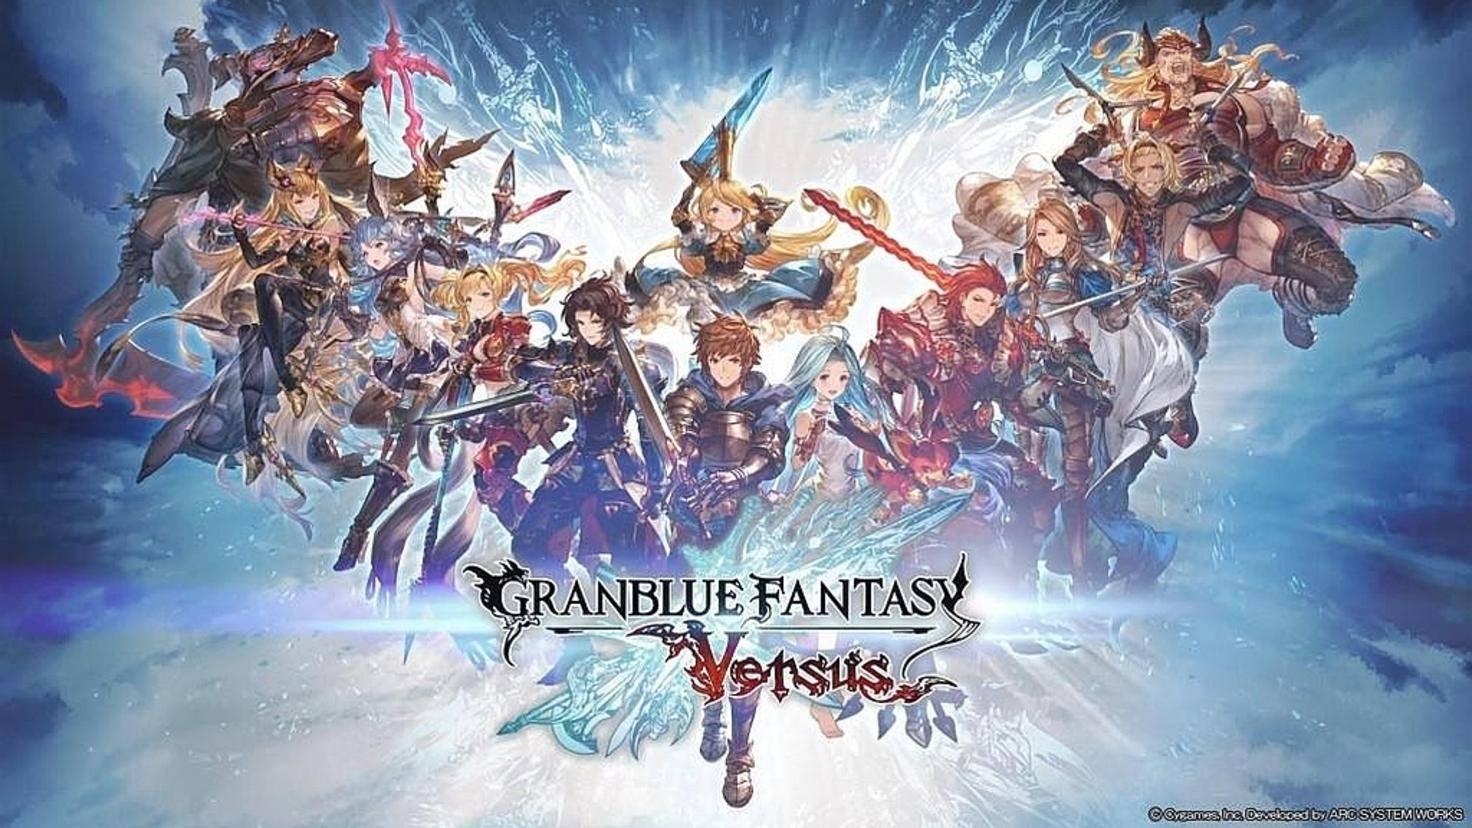 granblue-fantasy-versus-charaktere-keyart